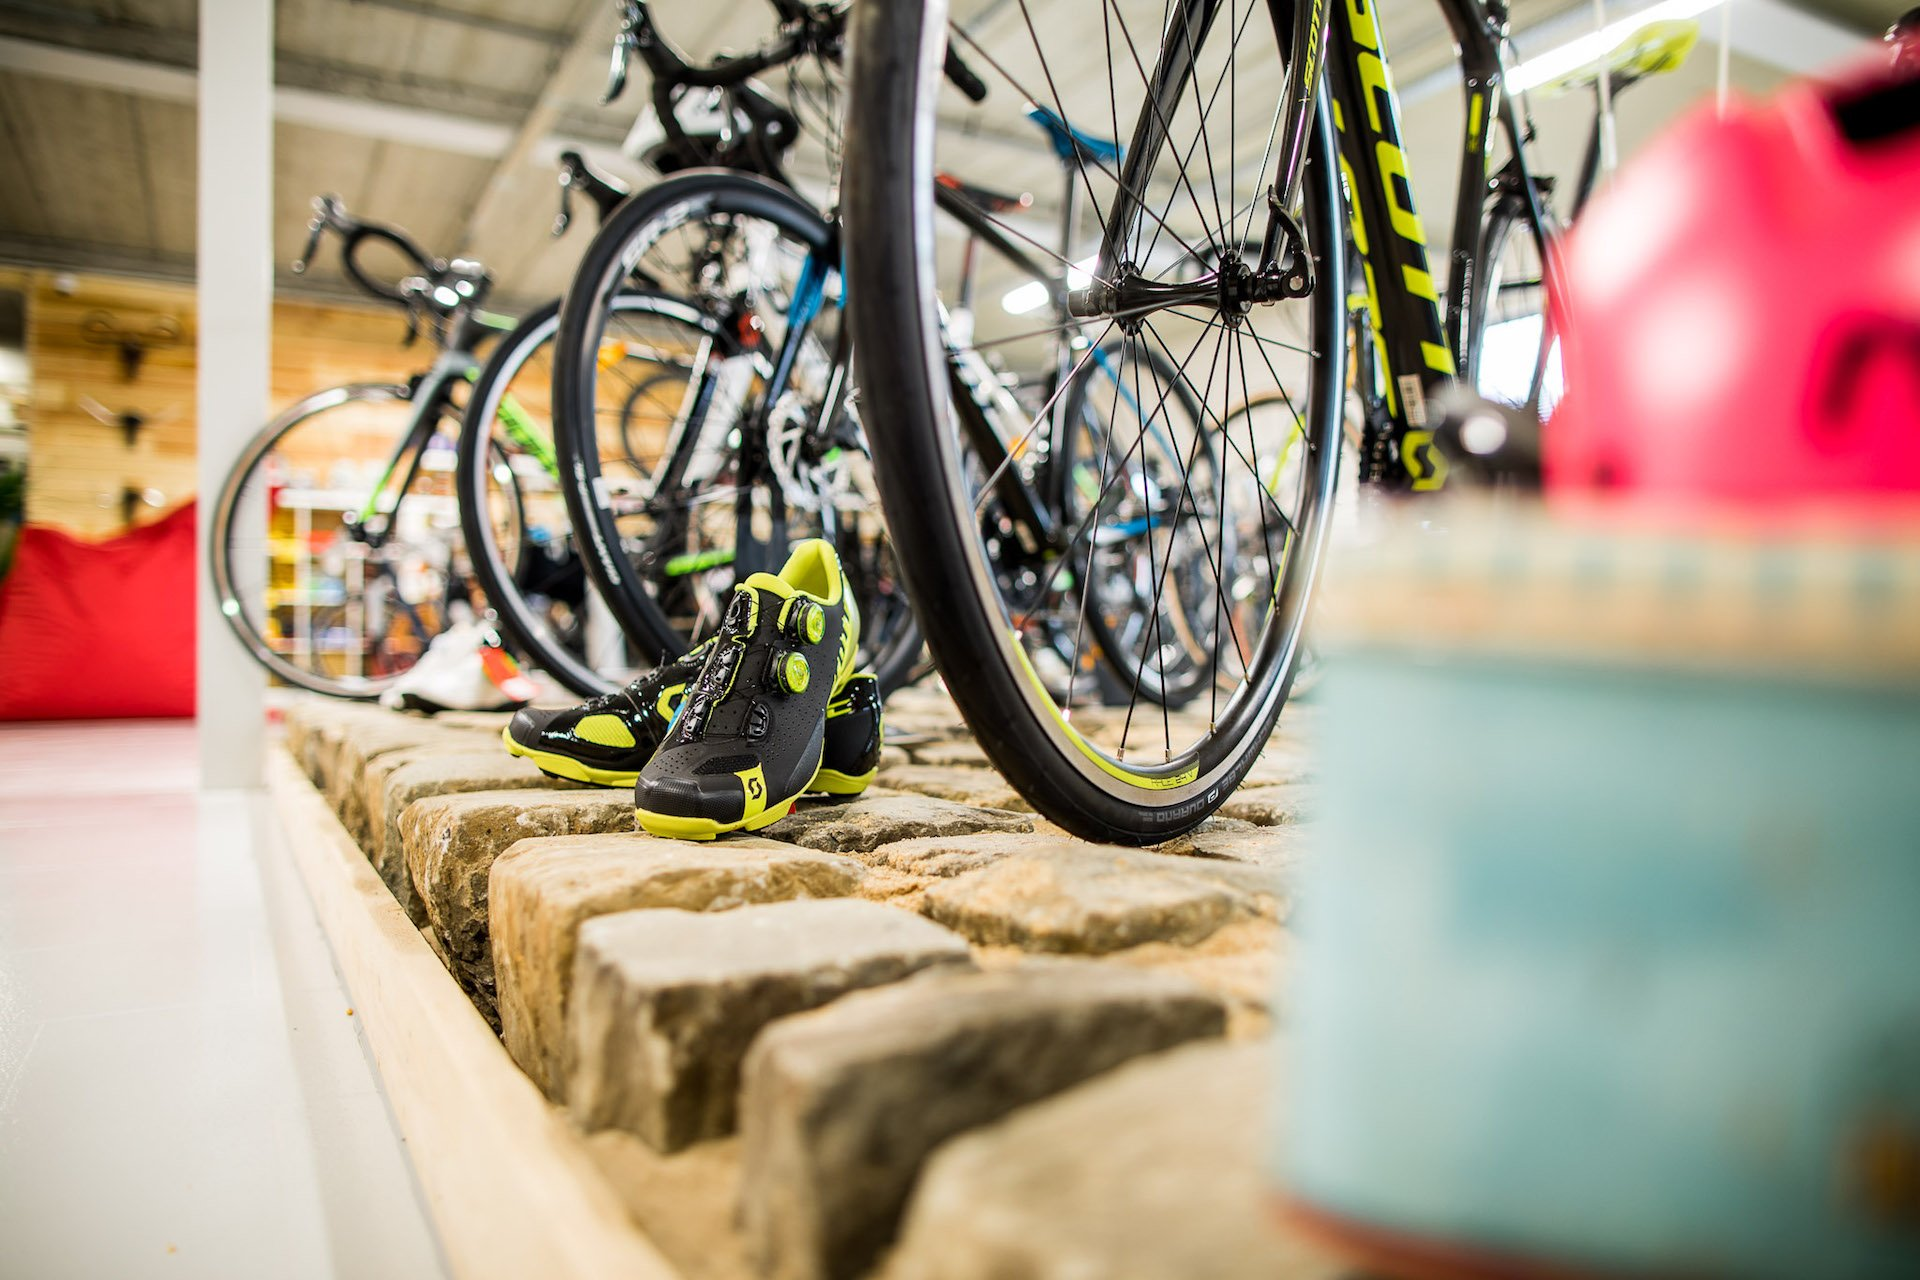 Labiecyclette – Fietshuis